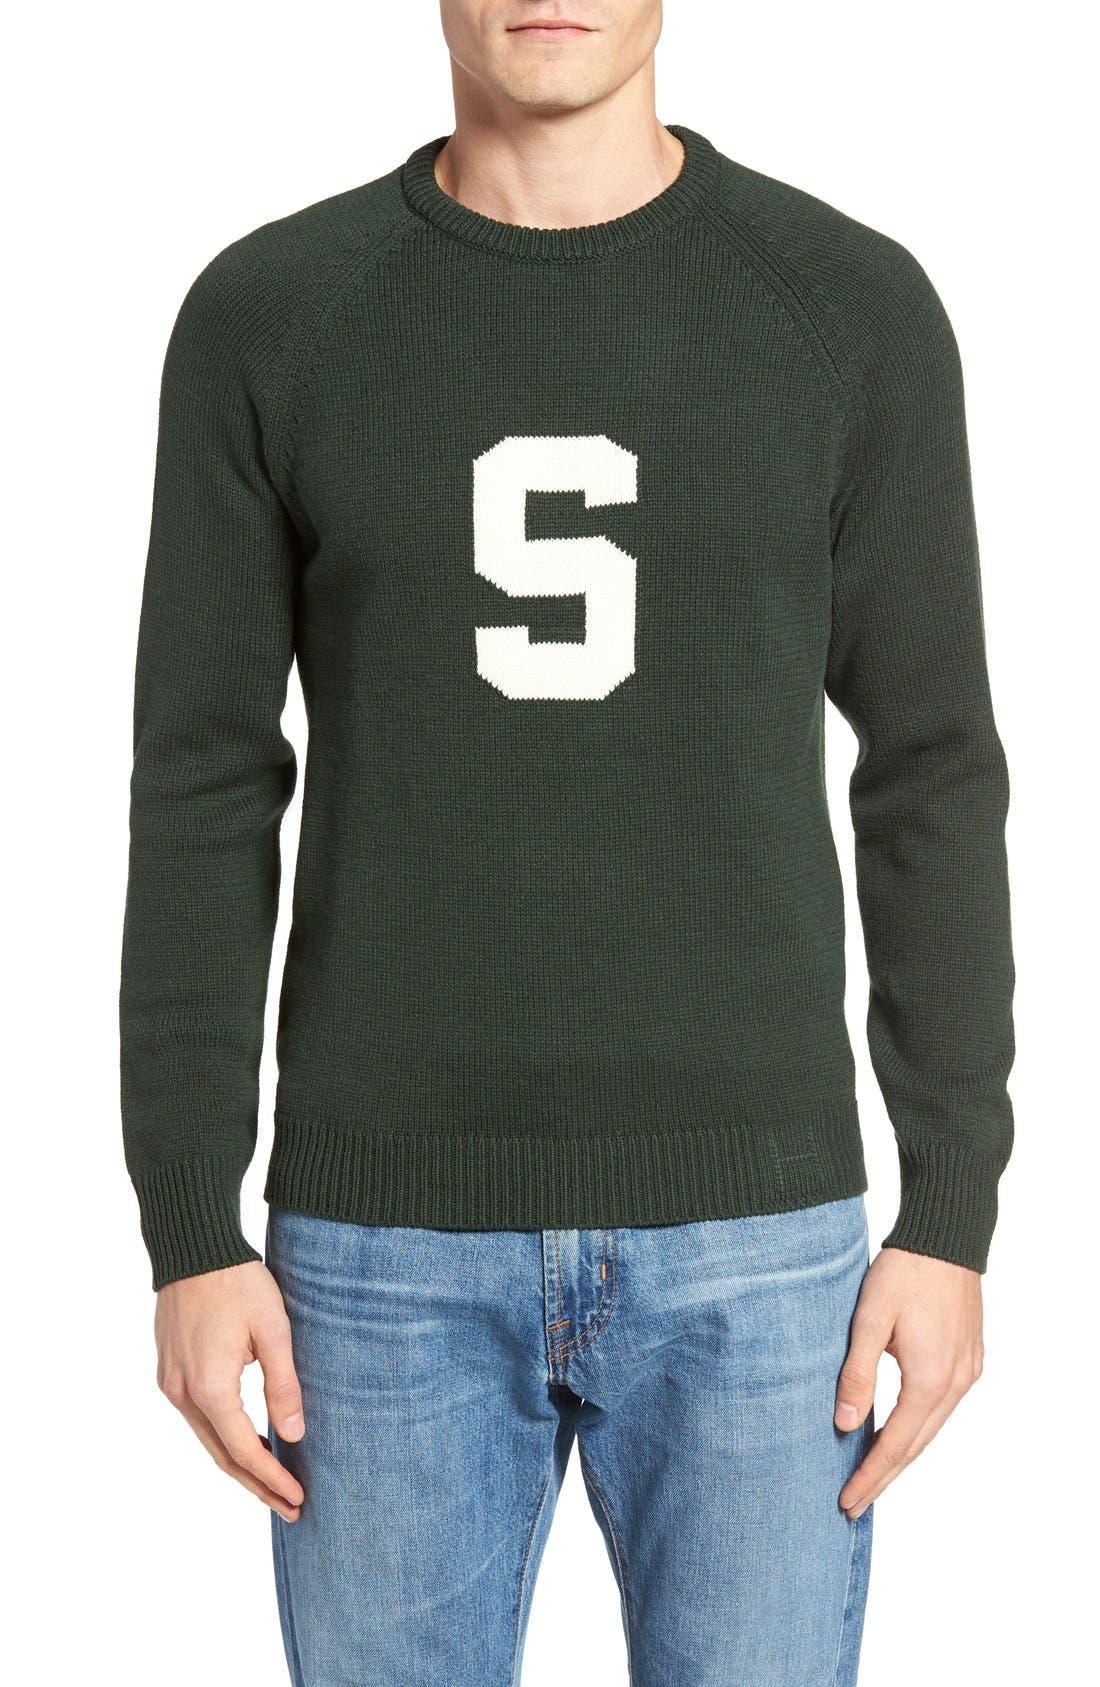 HILLFLINT,                             Michigan State Heritage Sweater,                             Main thumbnail 1, color,                             300